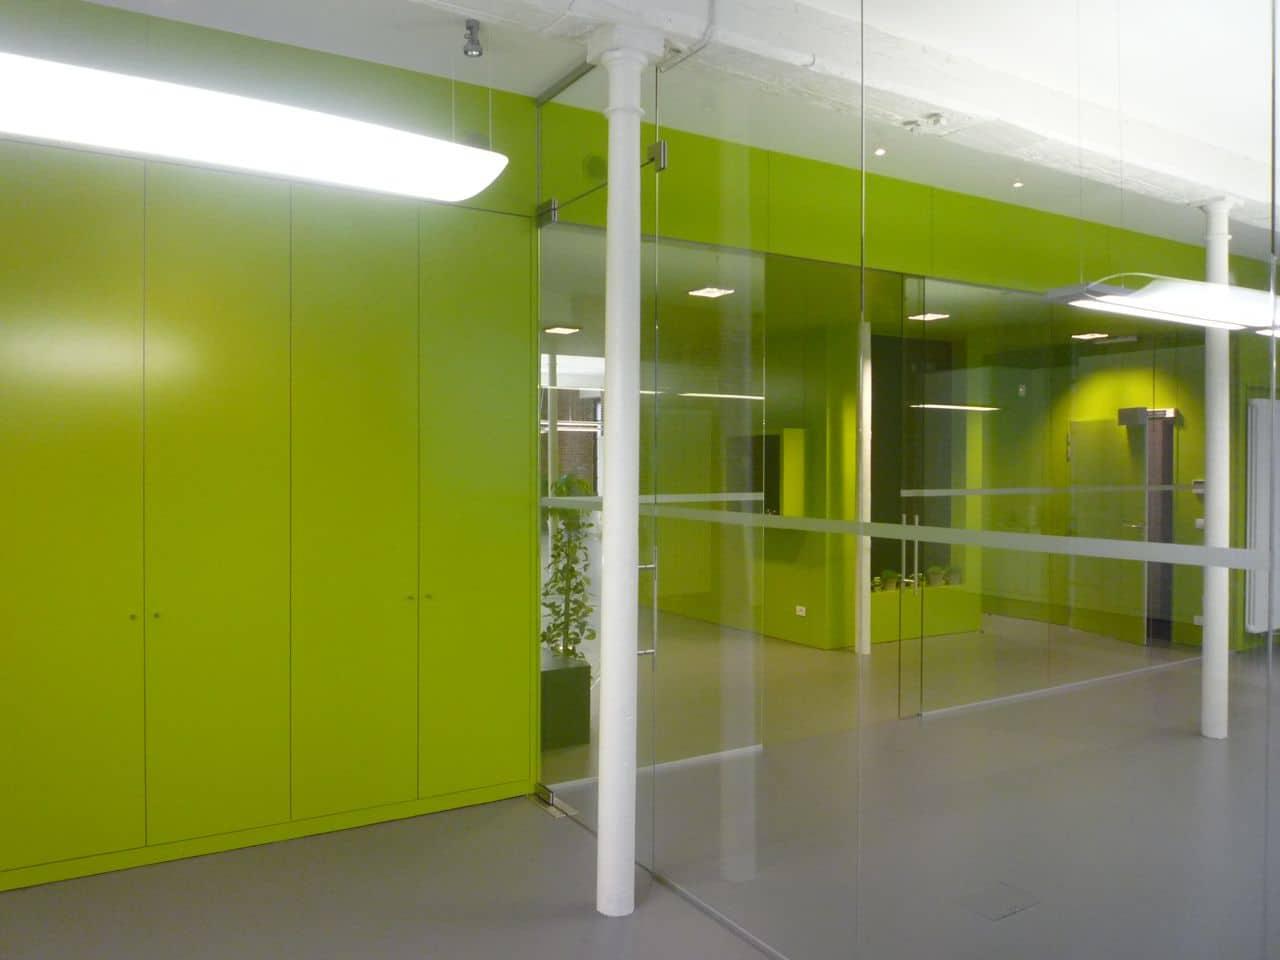 P1060734 | Baeyens & Beck architecten Gent | architect nieuwbouw renovatie interieur | high end | architectenbureau